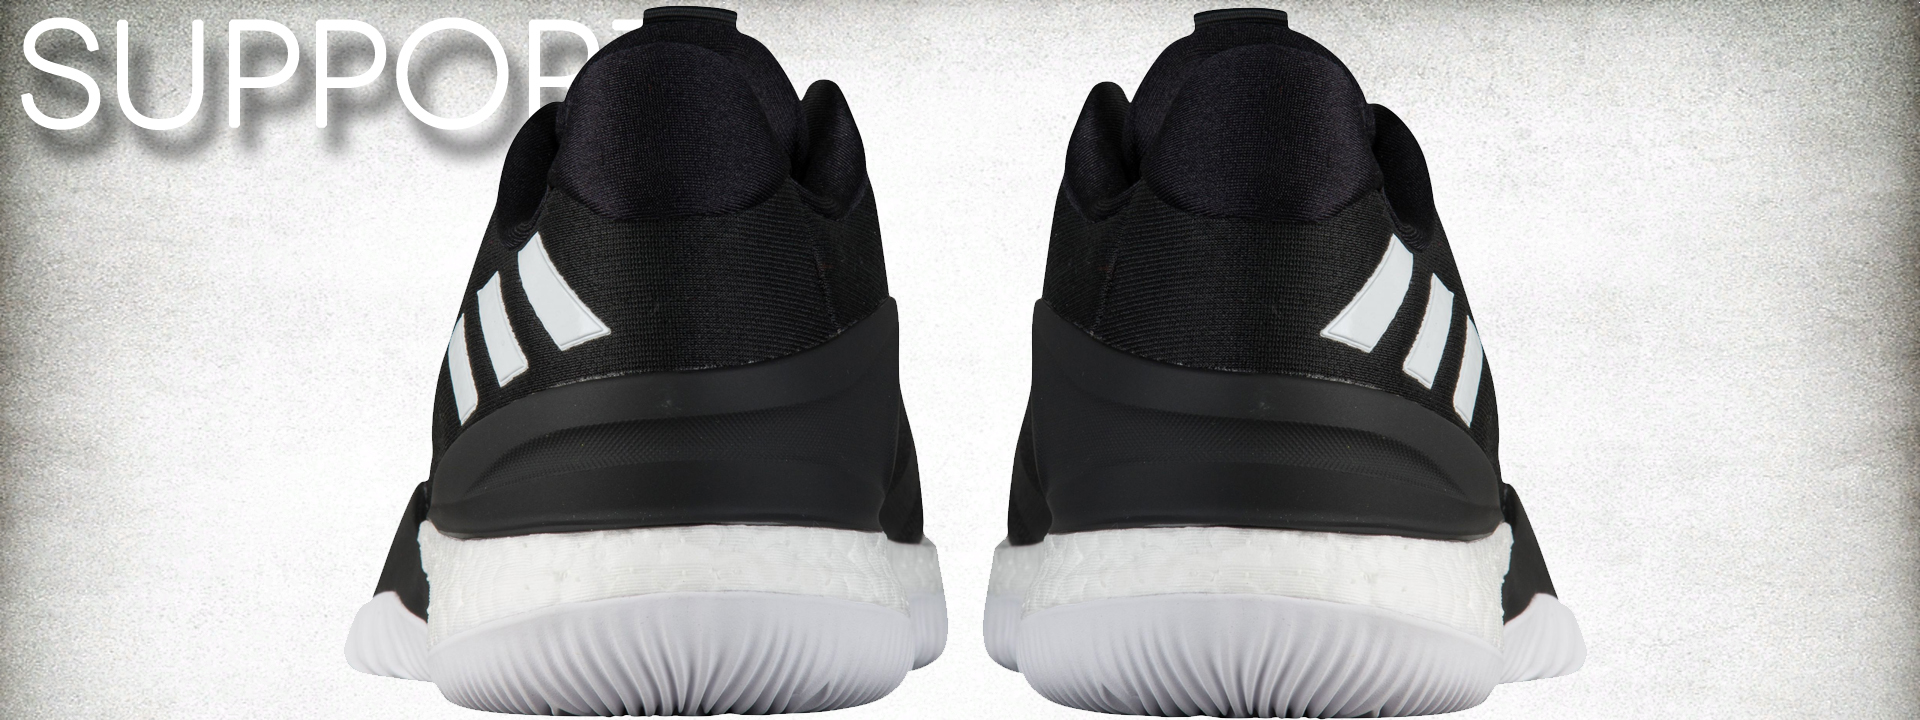 d44f7b33f4a4 ... good adidas crazylight boost 2018 performance review duke4005 support  0d5a7 18a3a